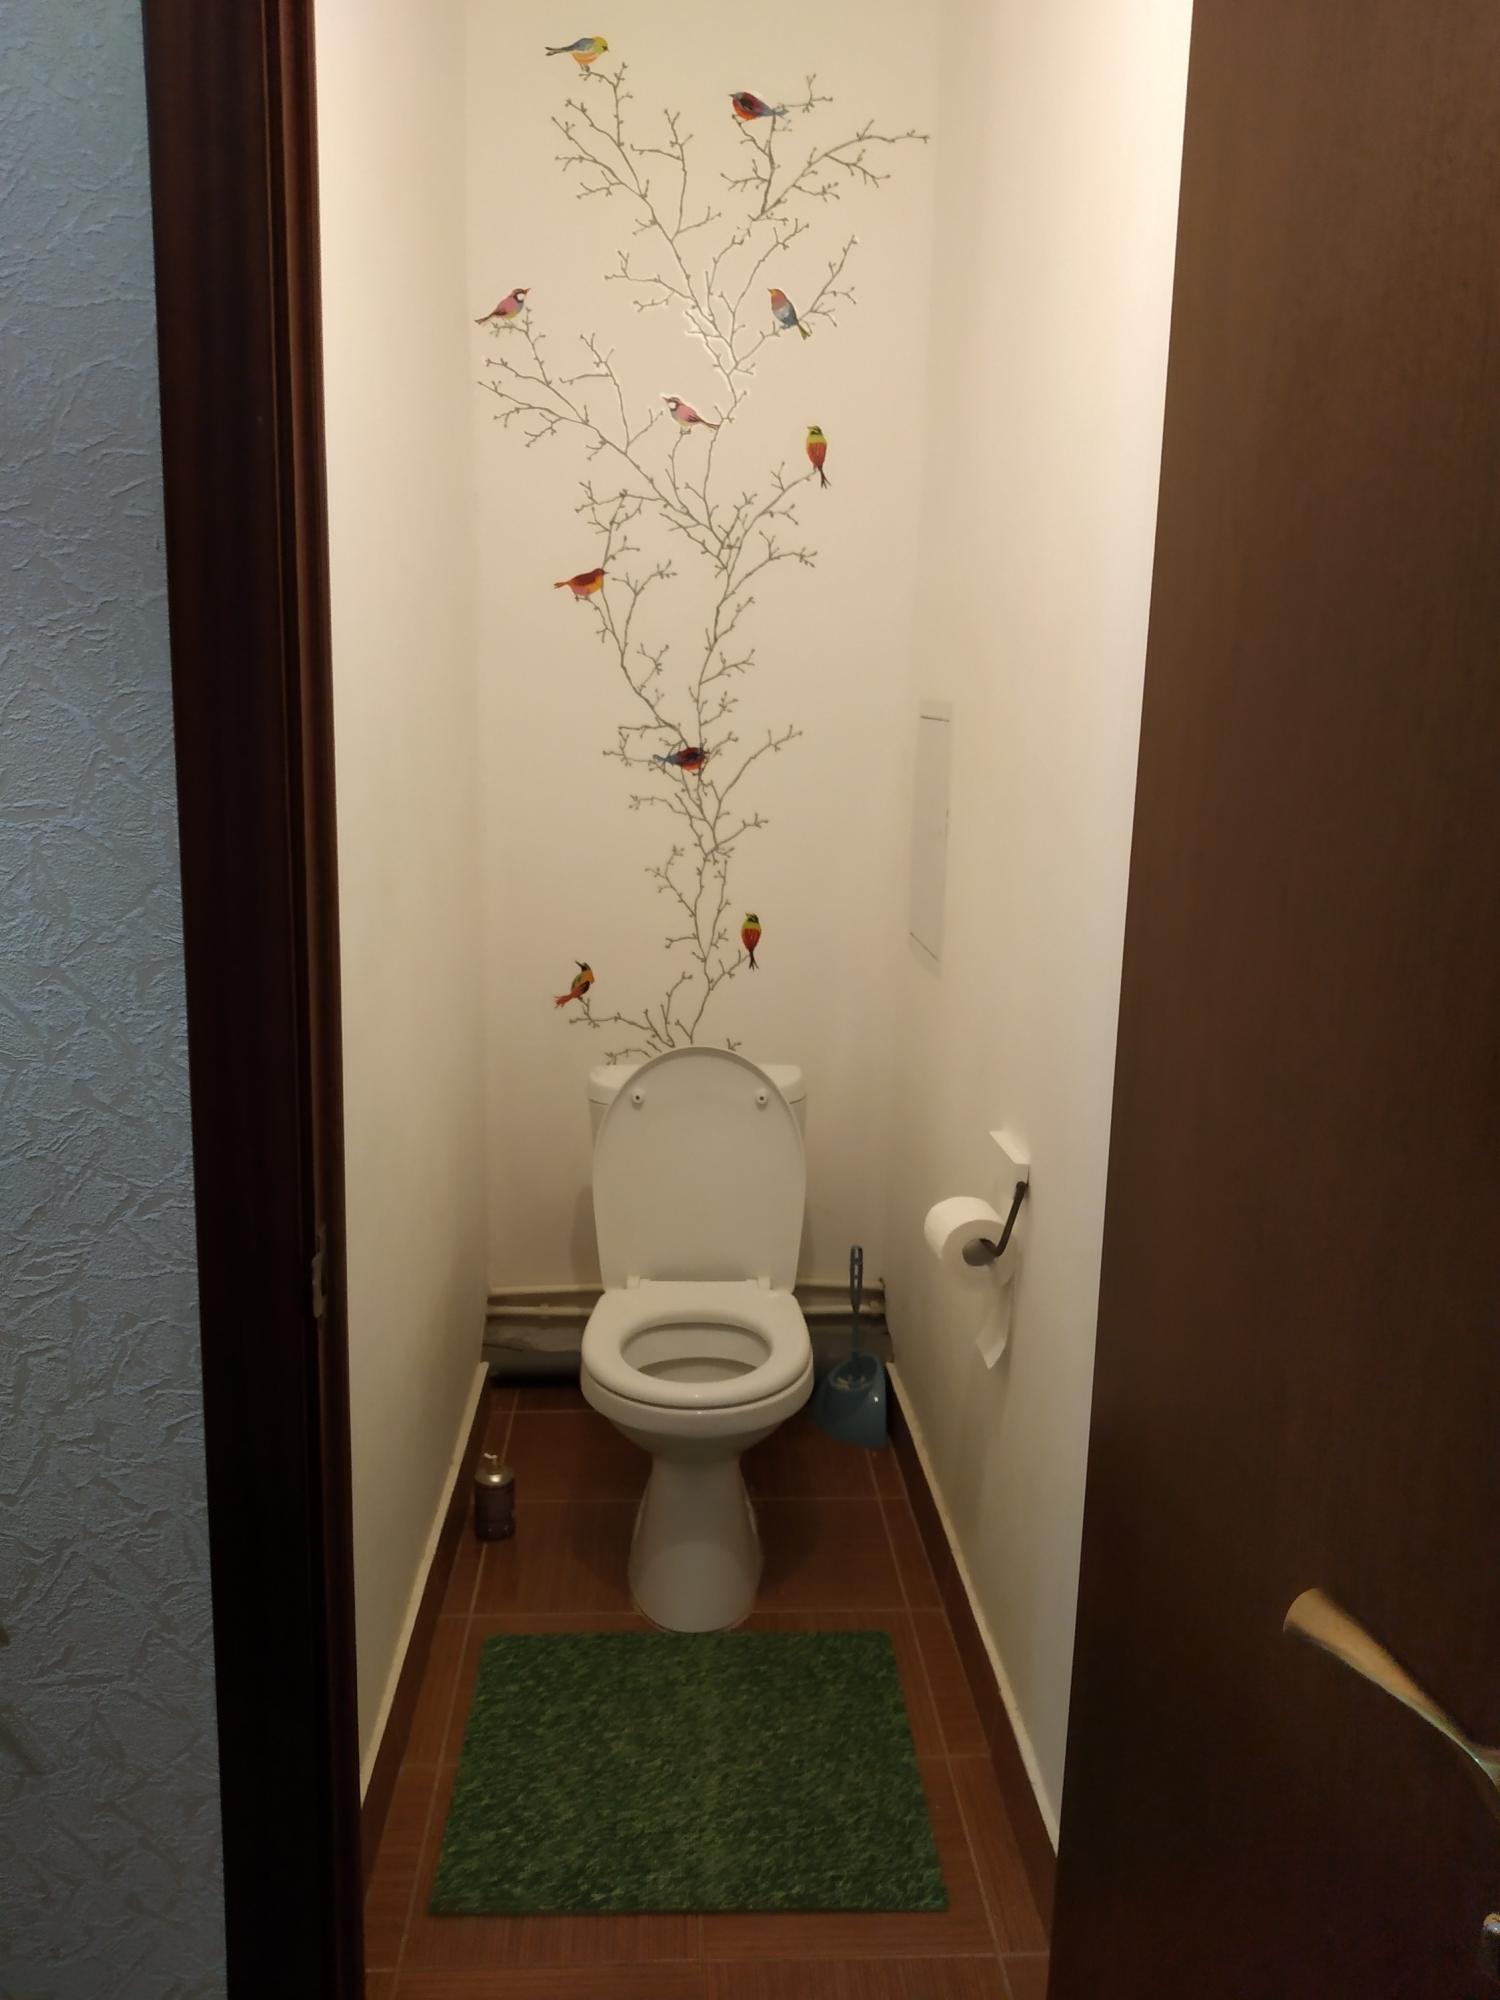 Квартира, 2 комнаты, 65 м² 89031834137 купить 5